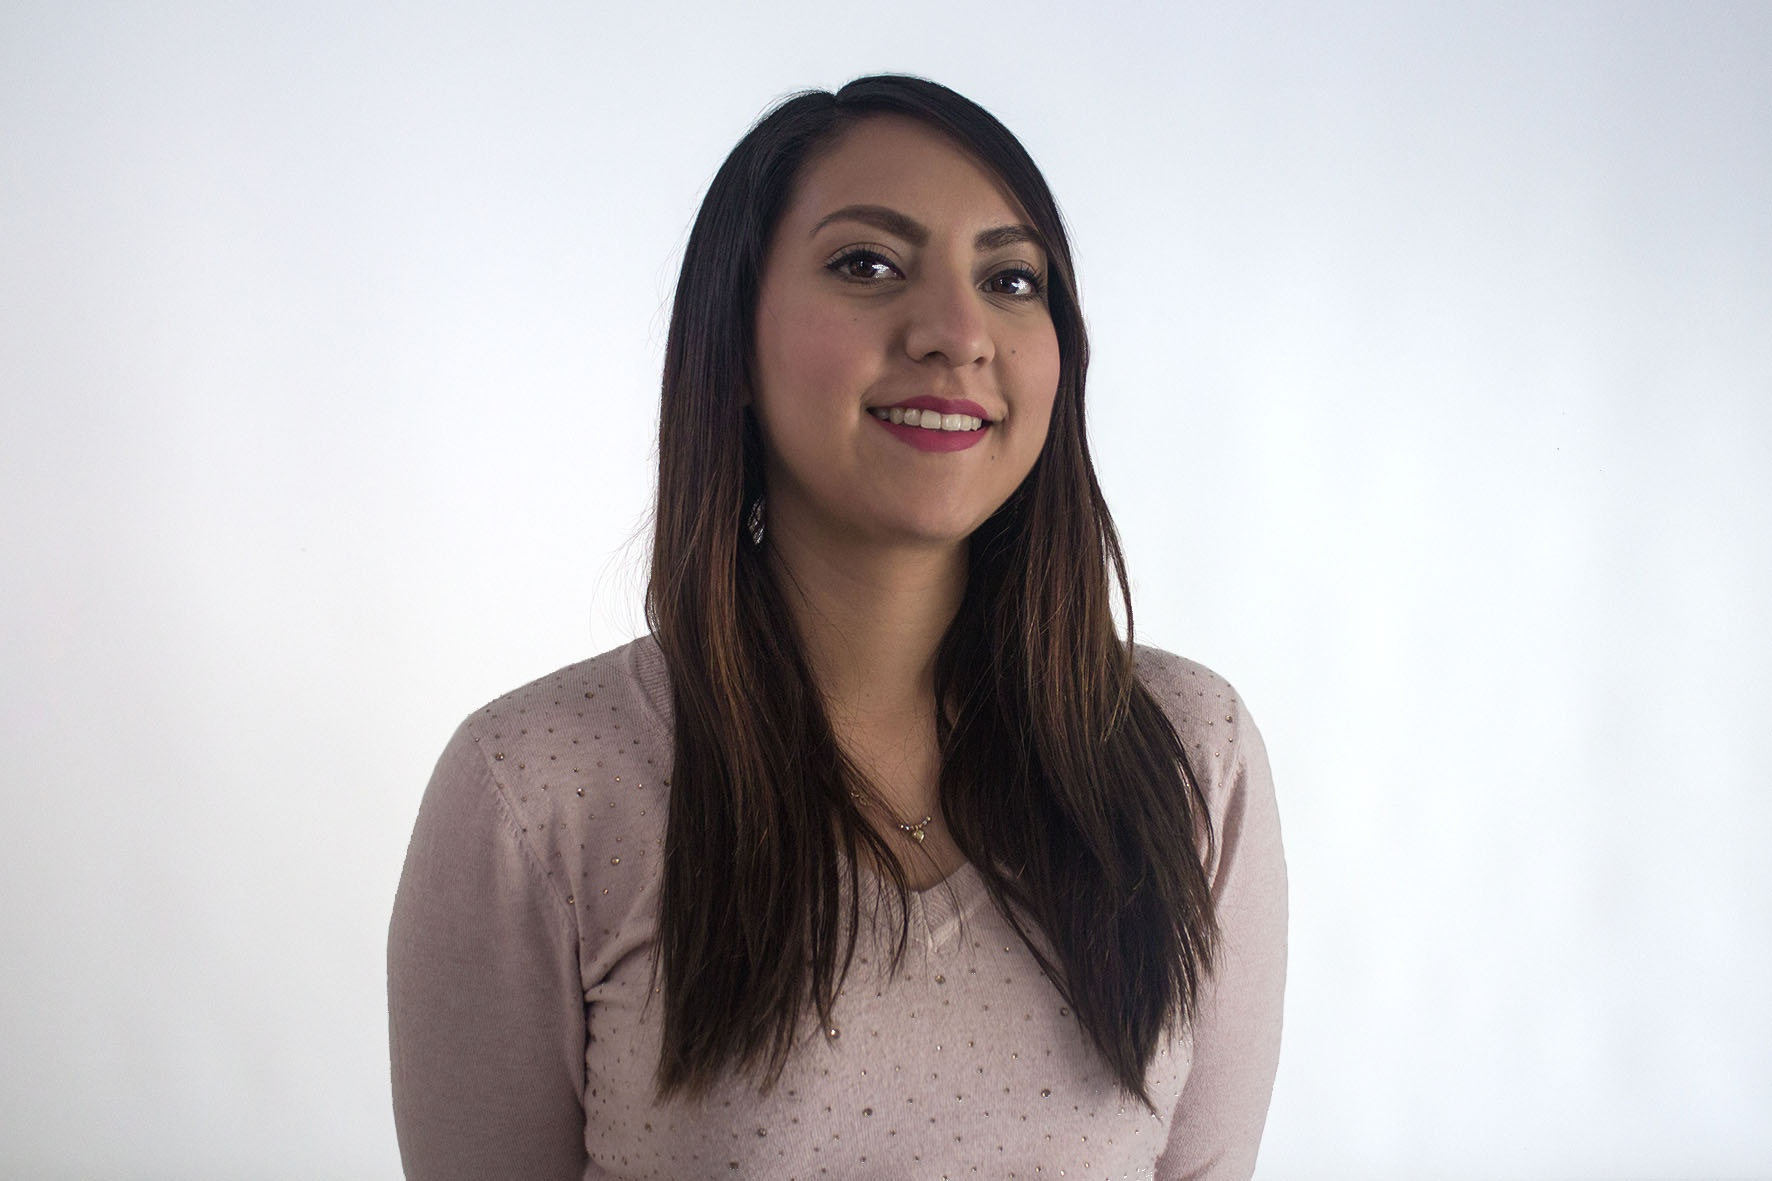 Luisa Balderas